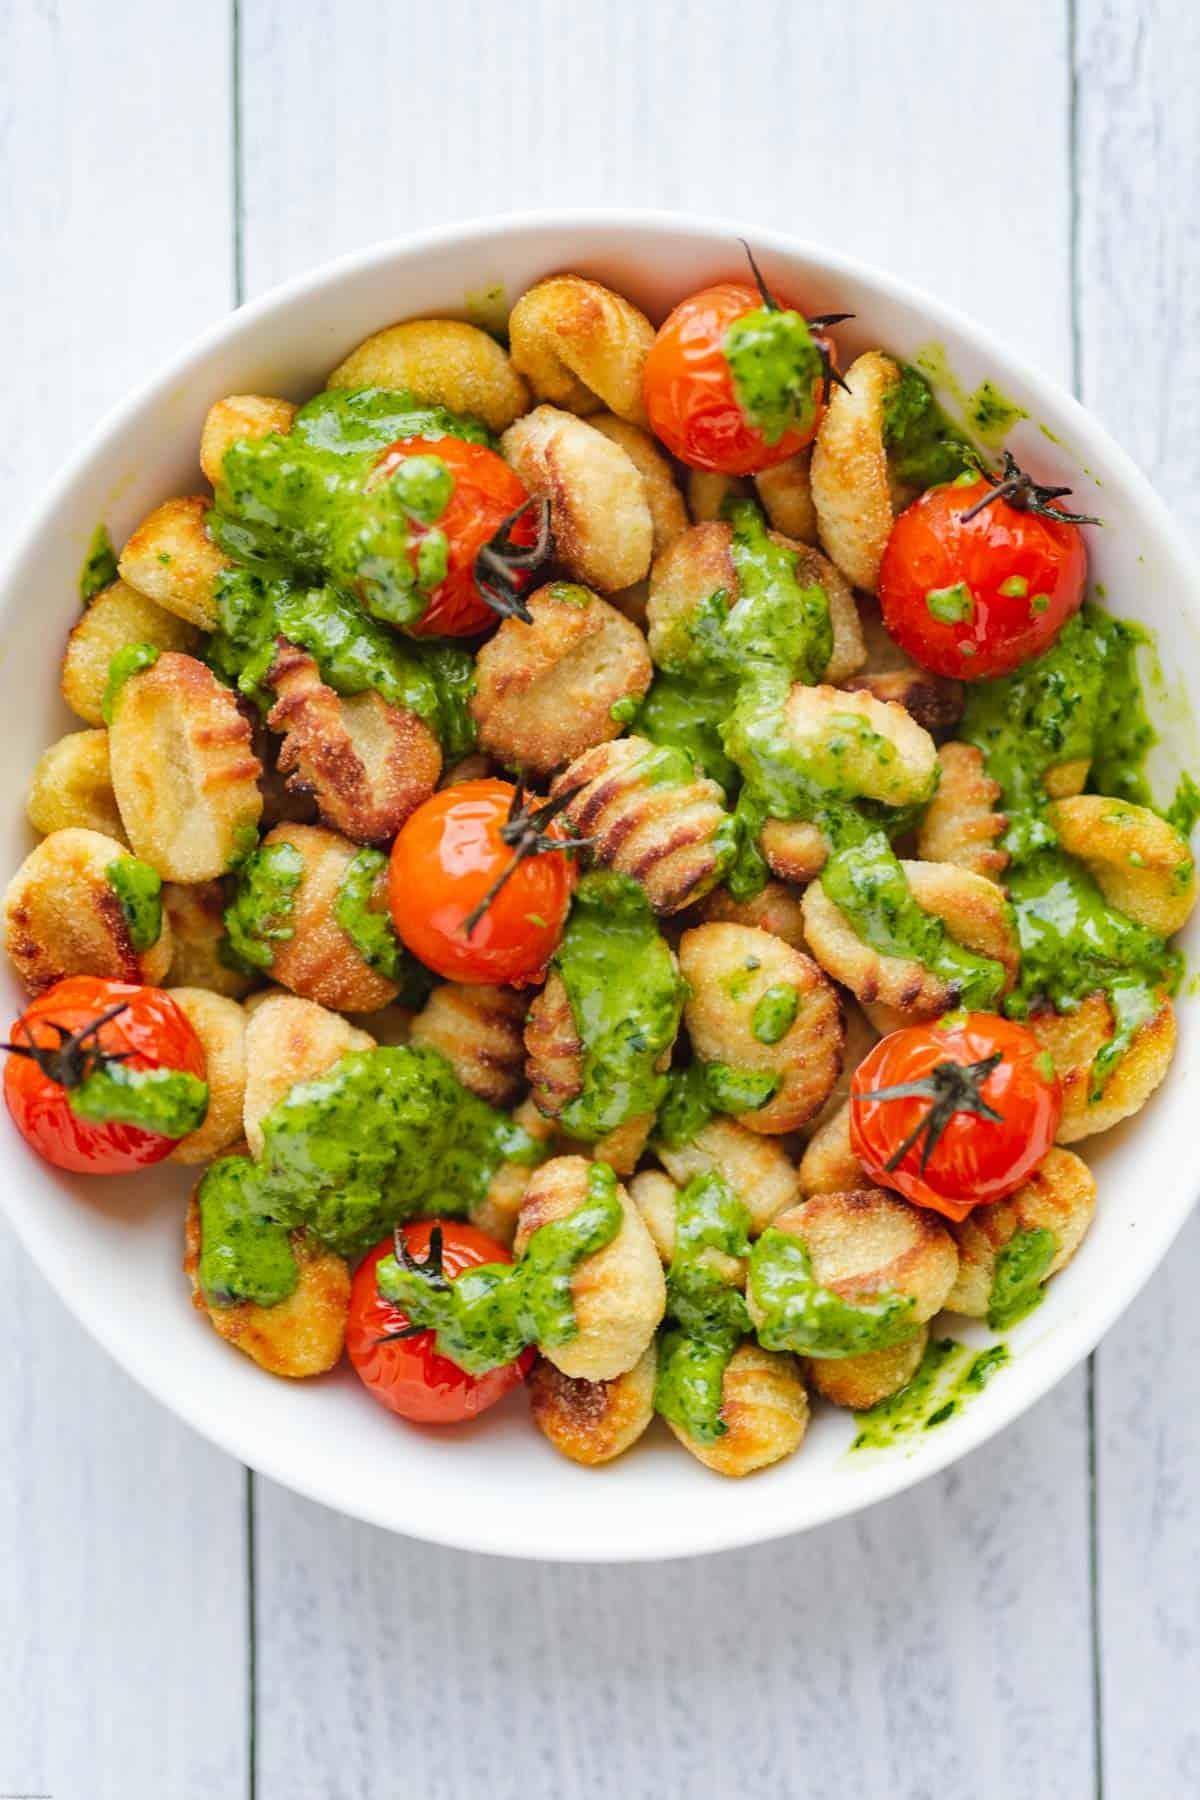 Pesto-Gnocchi & Burst Tomatoes in a white bowl.